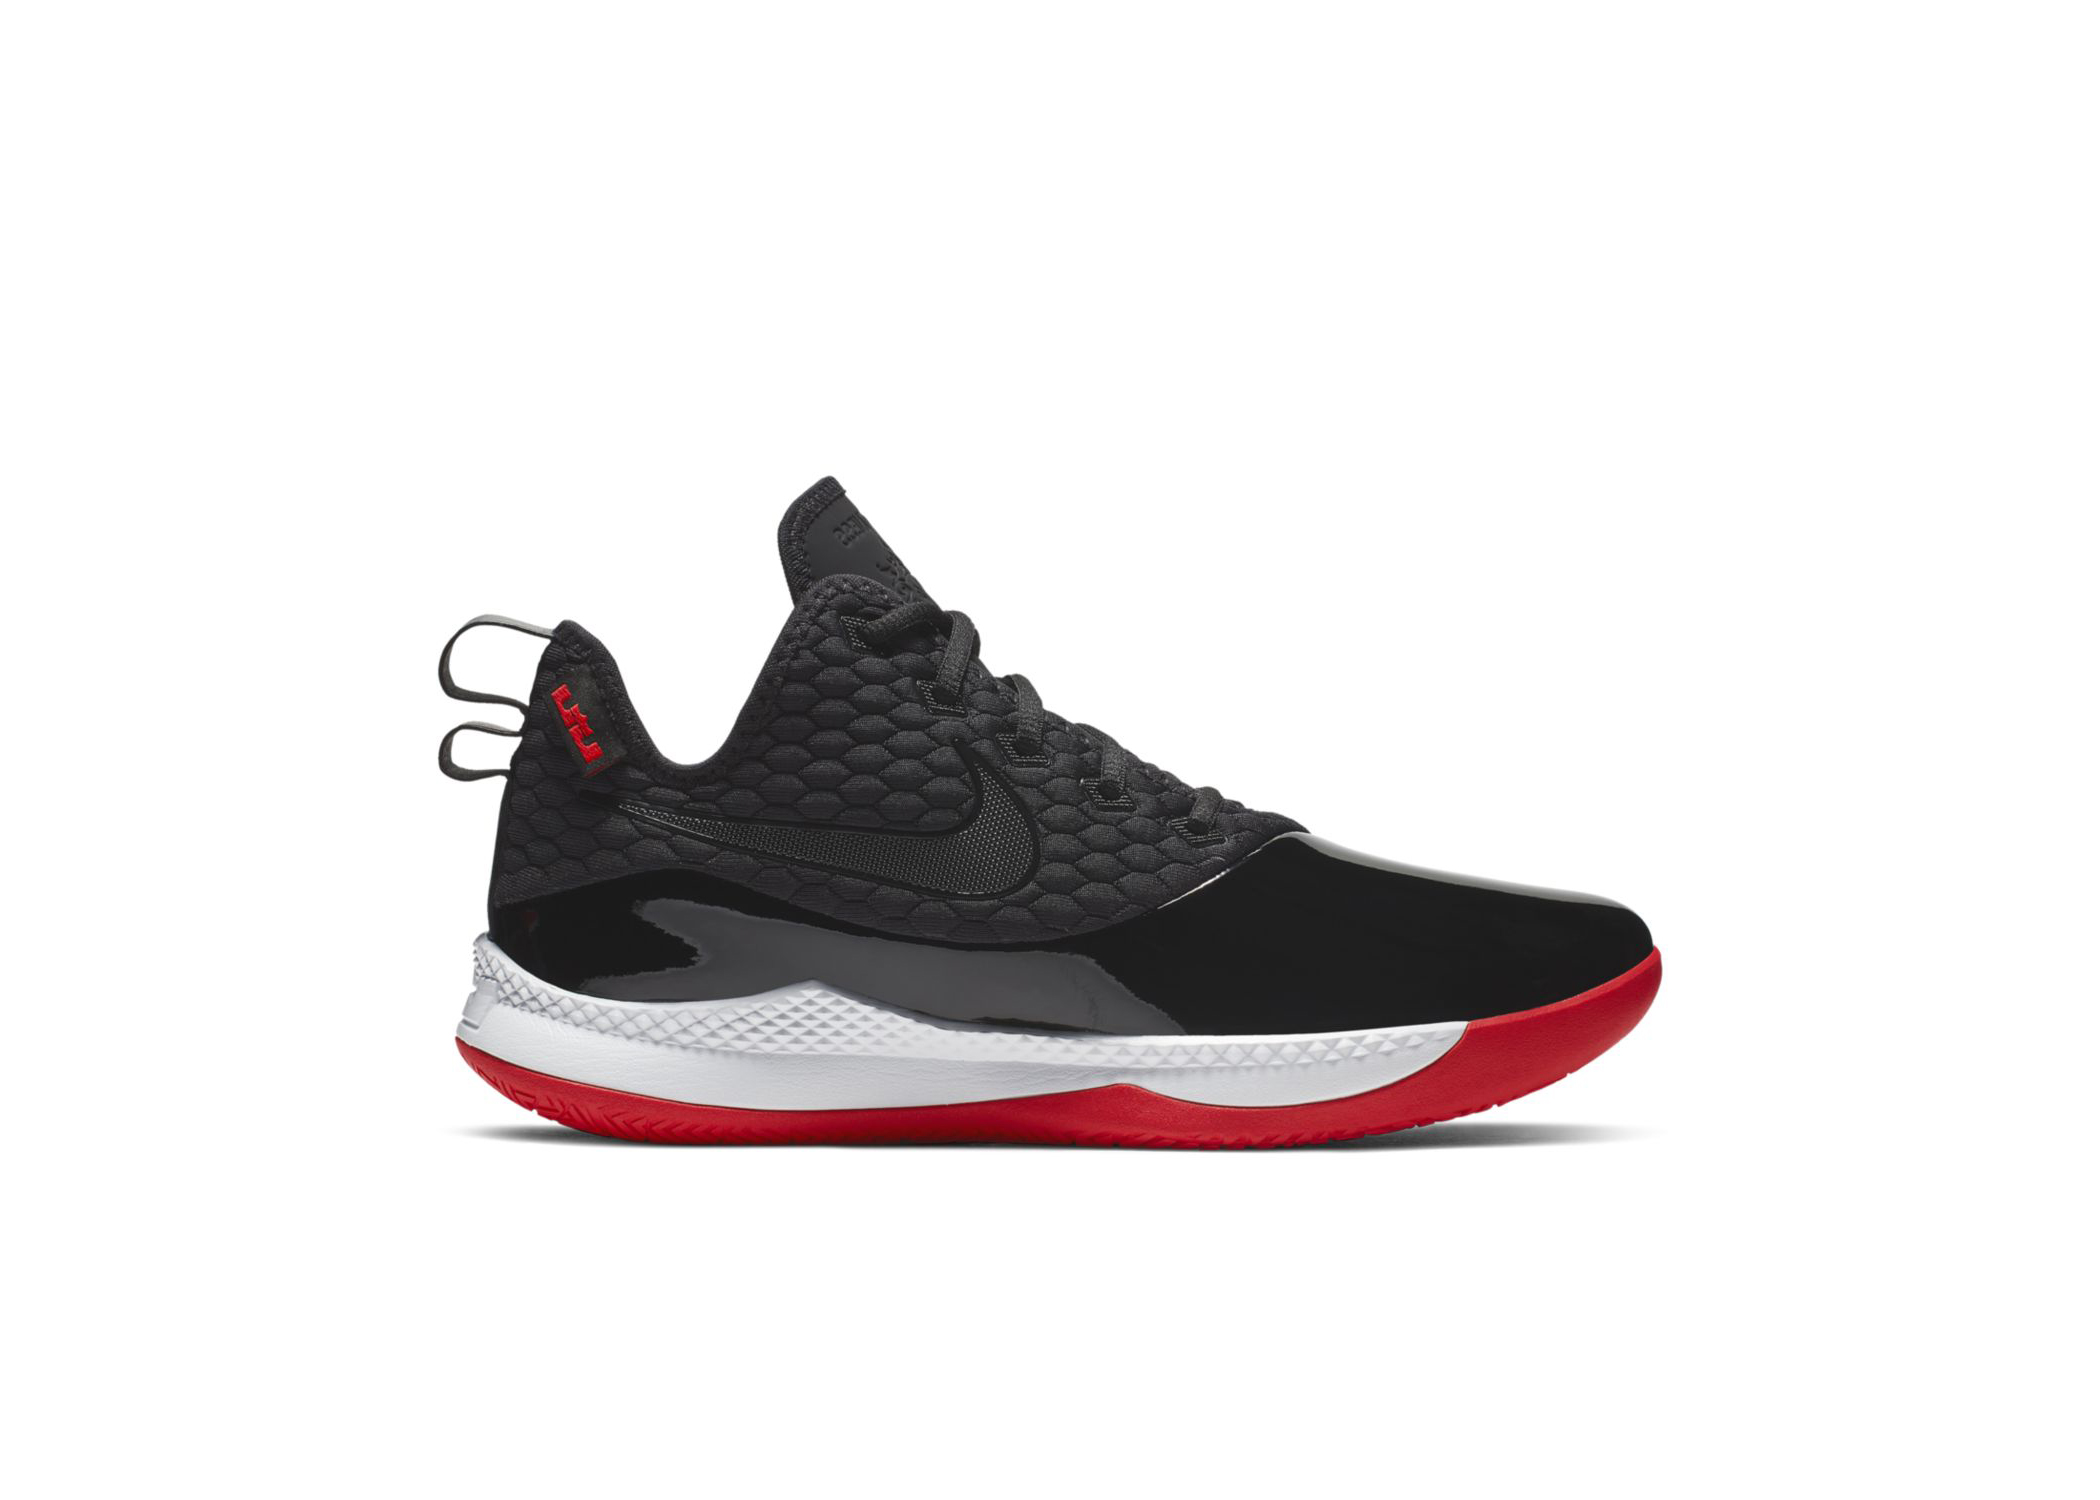 Nike Lebron Witness 3 PRM Black